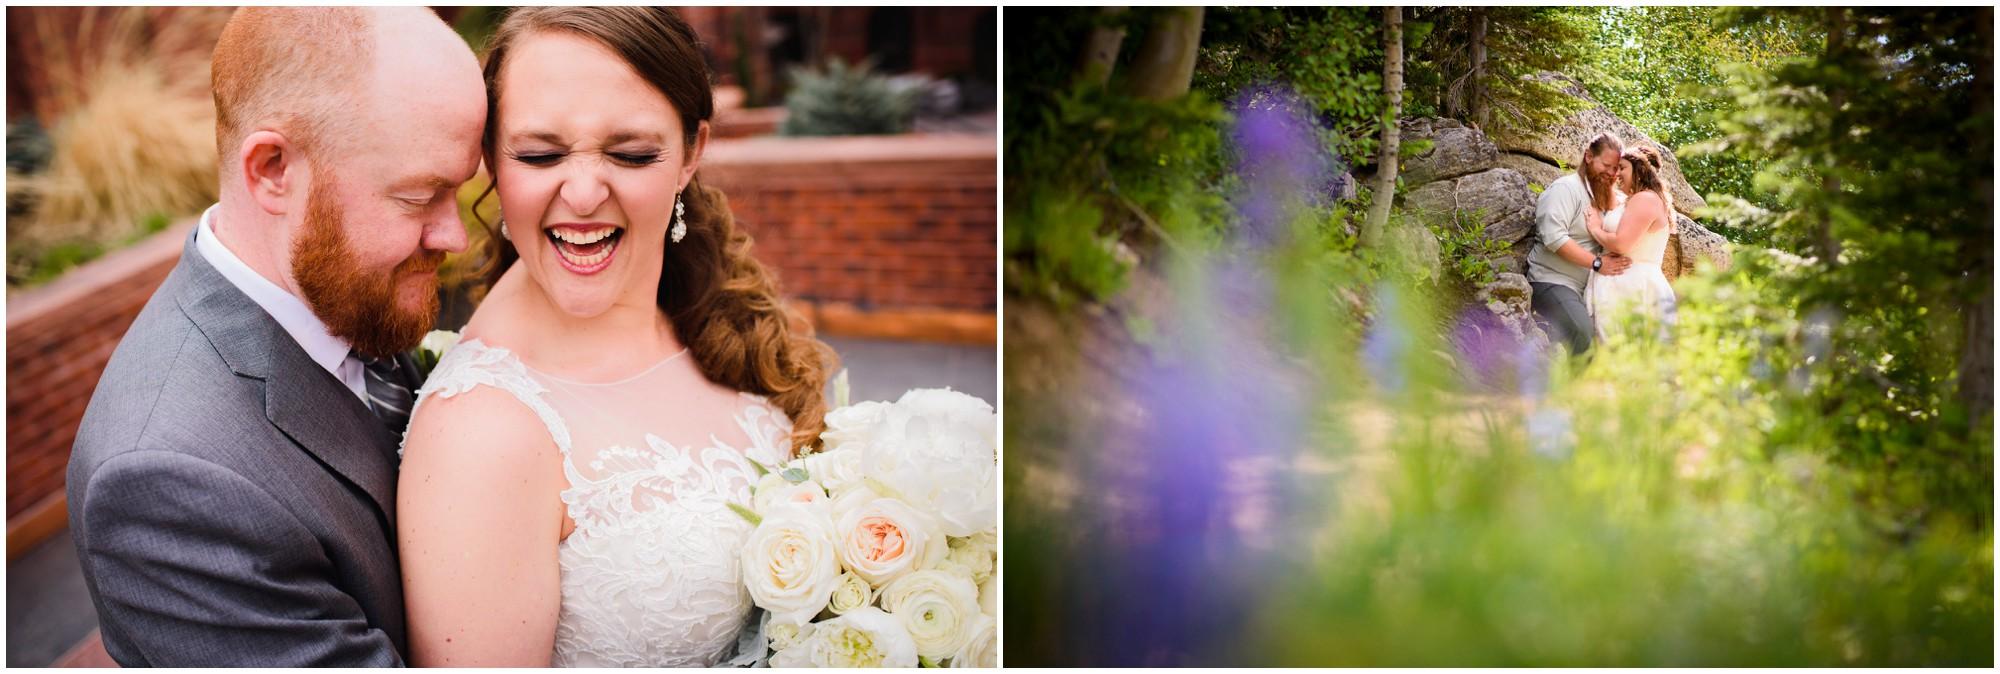 377-Snowmass-colorado-winter-wedding.jpg